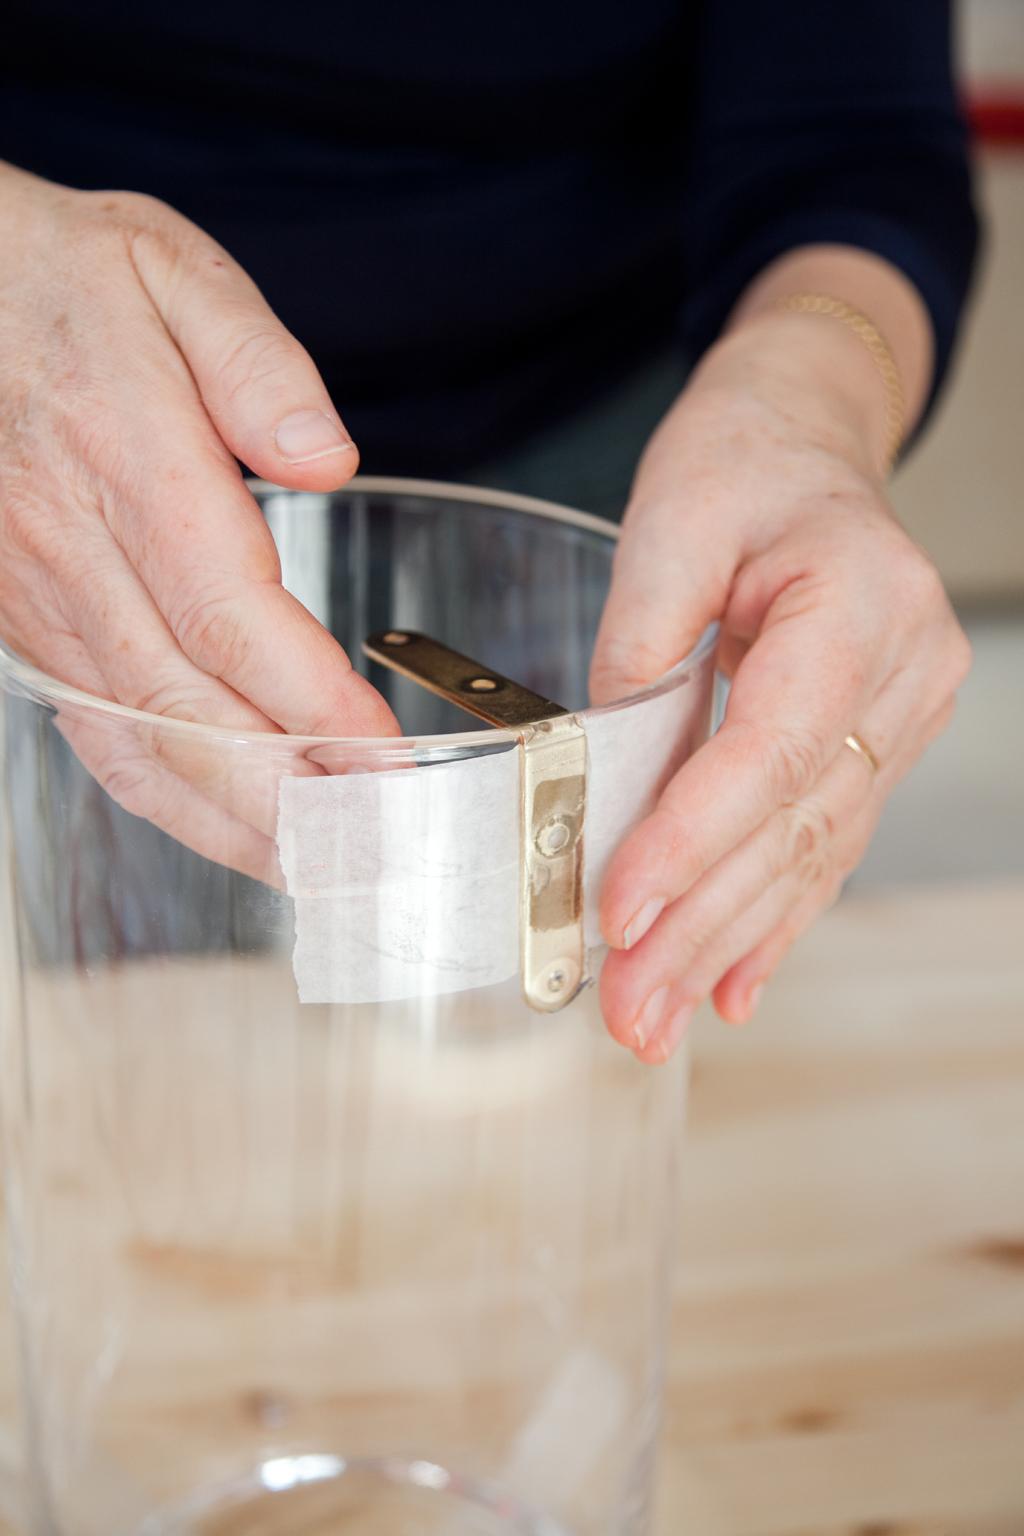 Creer une lampe transaparente avec un vase